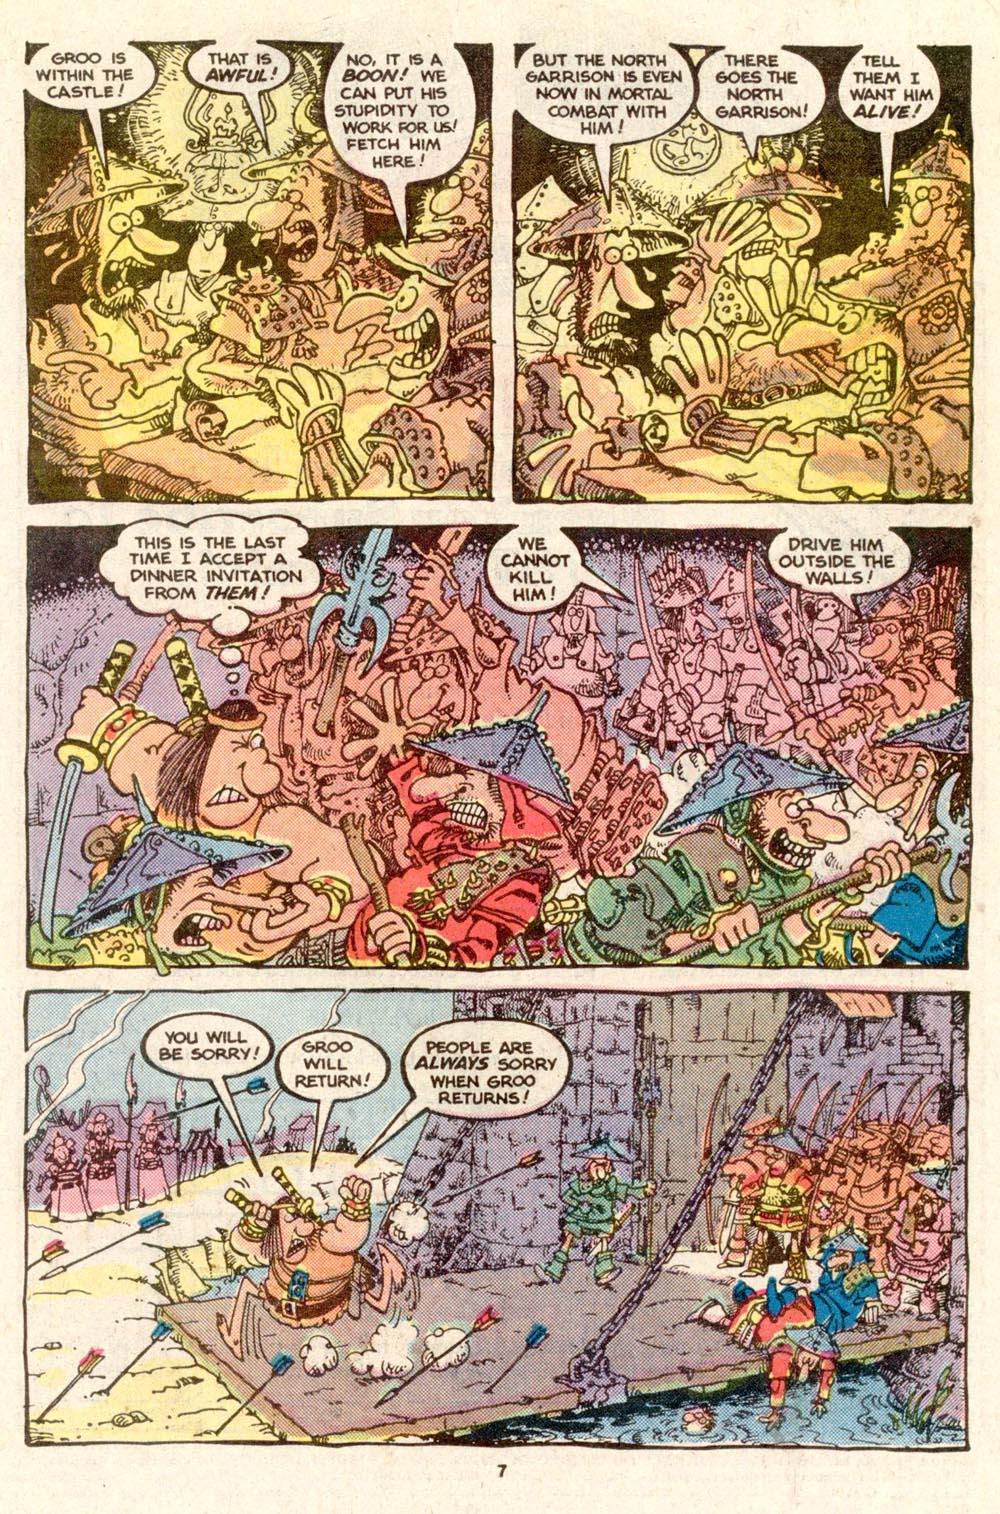 Read online Sergio Aragonés Groo the Wanderer comic -  Issue #19 - 7